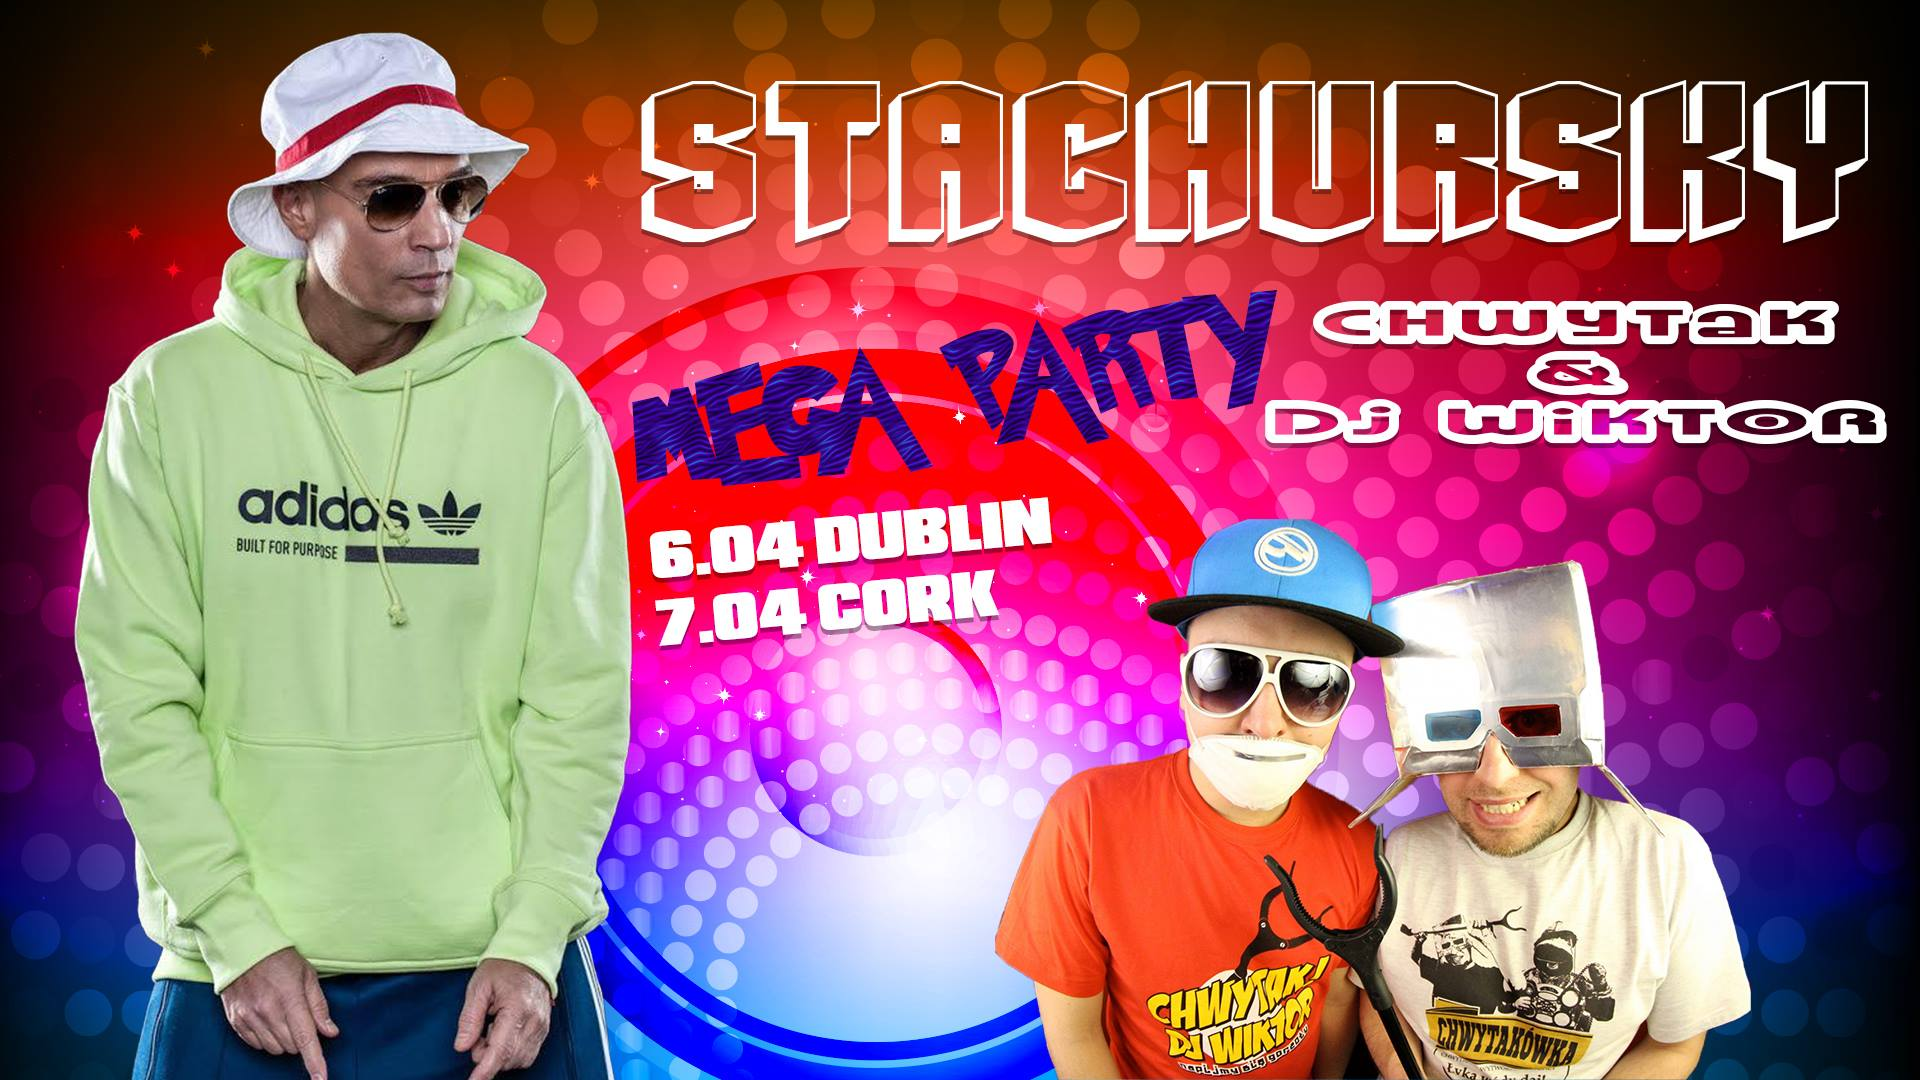 MEGA PARTY Dublin - Stachursky, Chwytak, DJ Wiktor